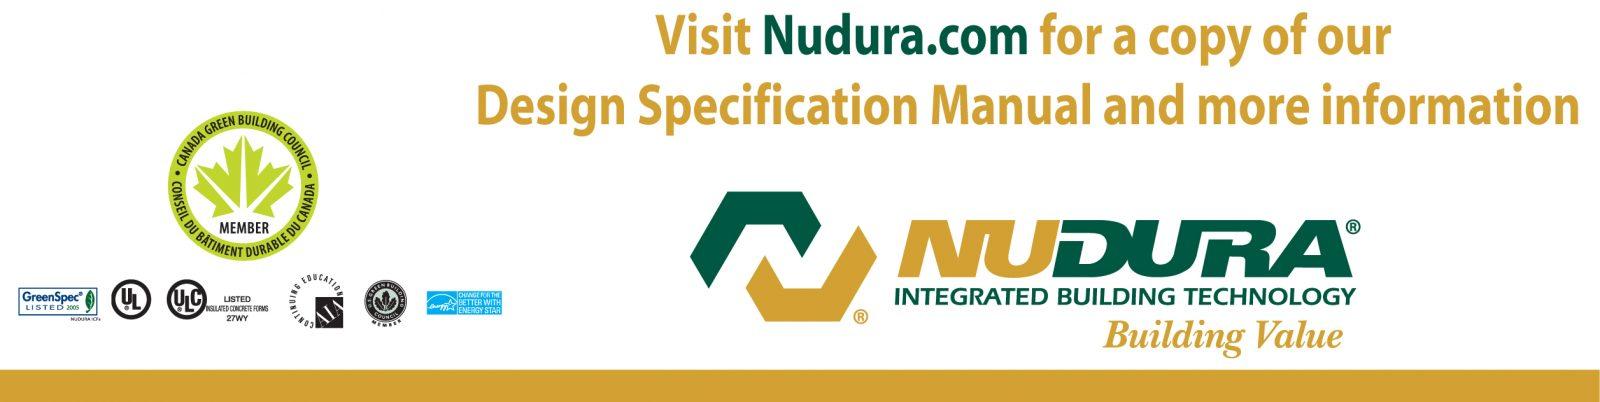 Visit Nudura.com for Design Specification manual